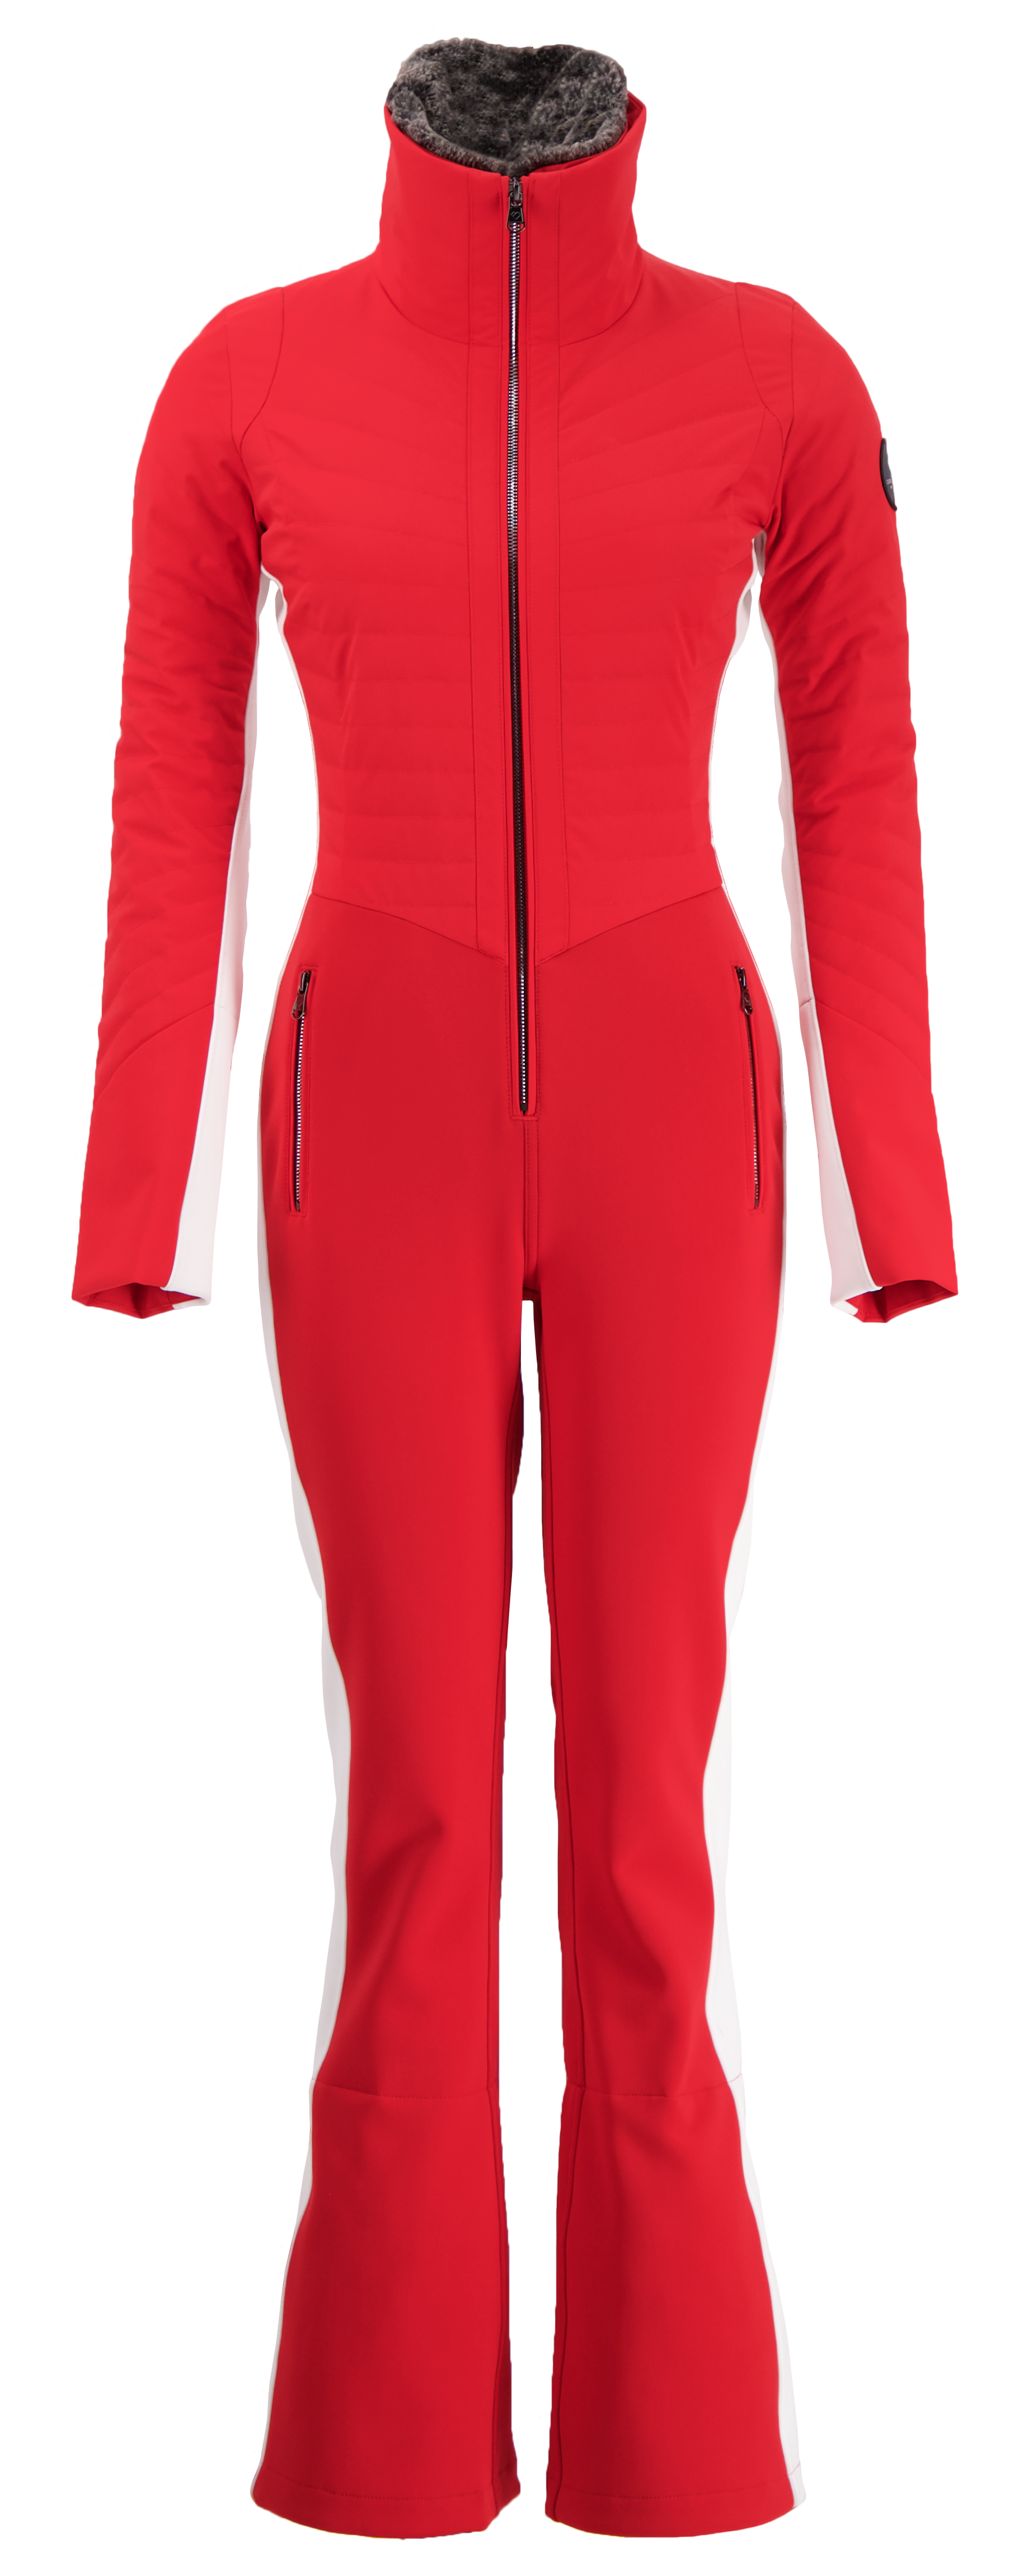 The Stöckli Nela 88 Women's All-Mountain Ski thumb